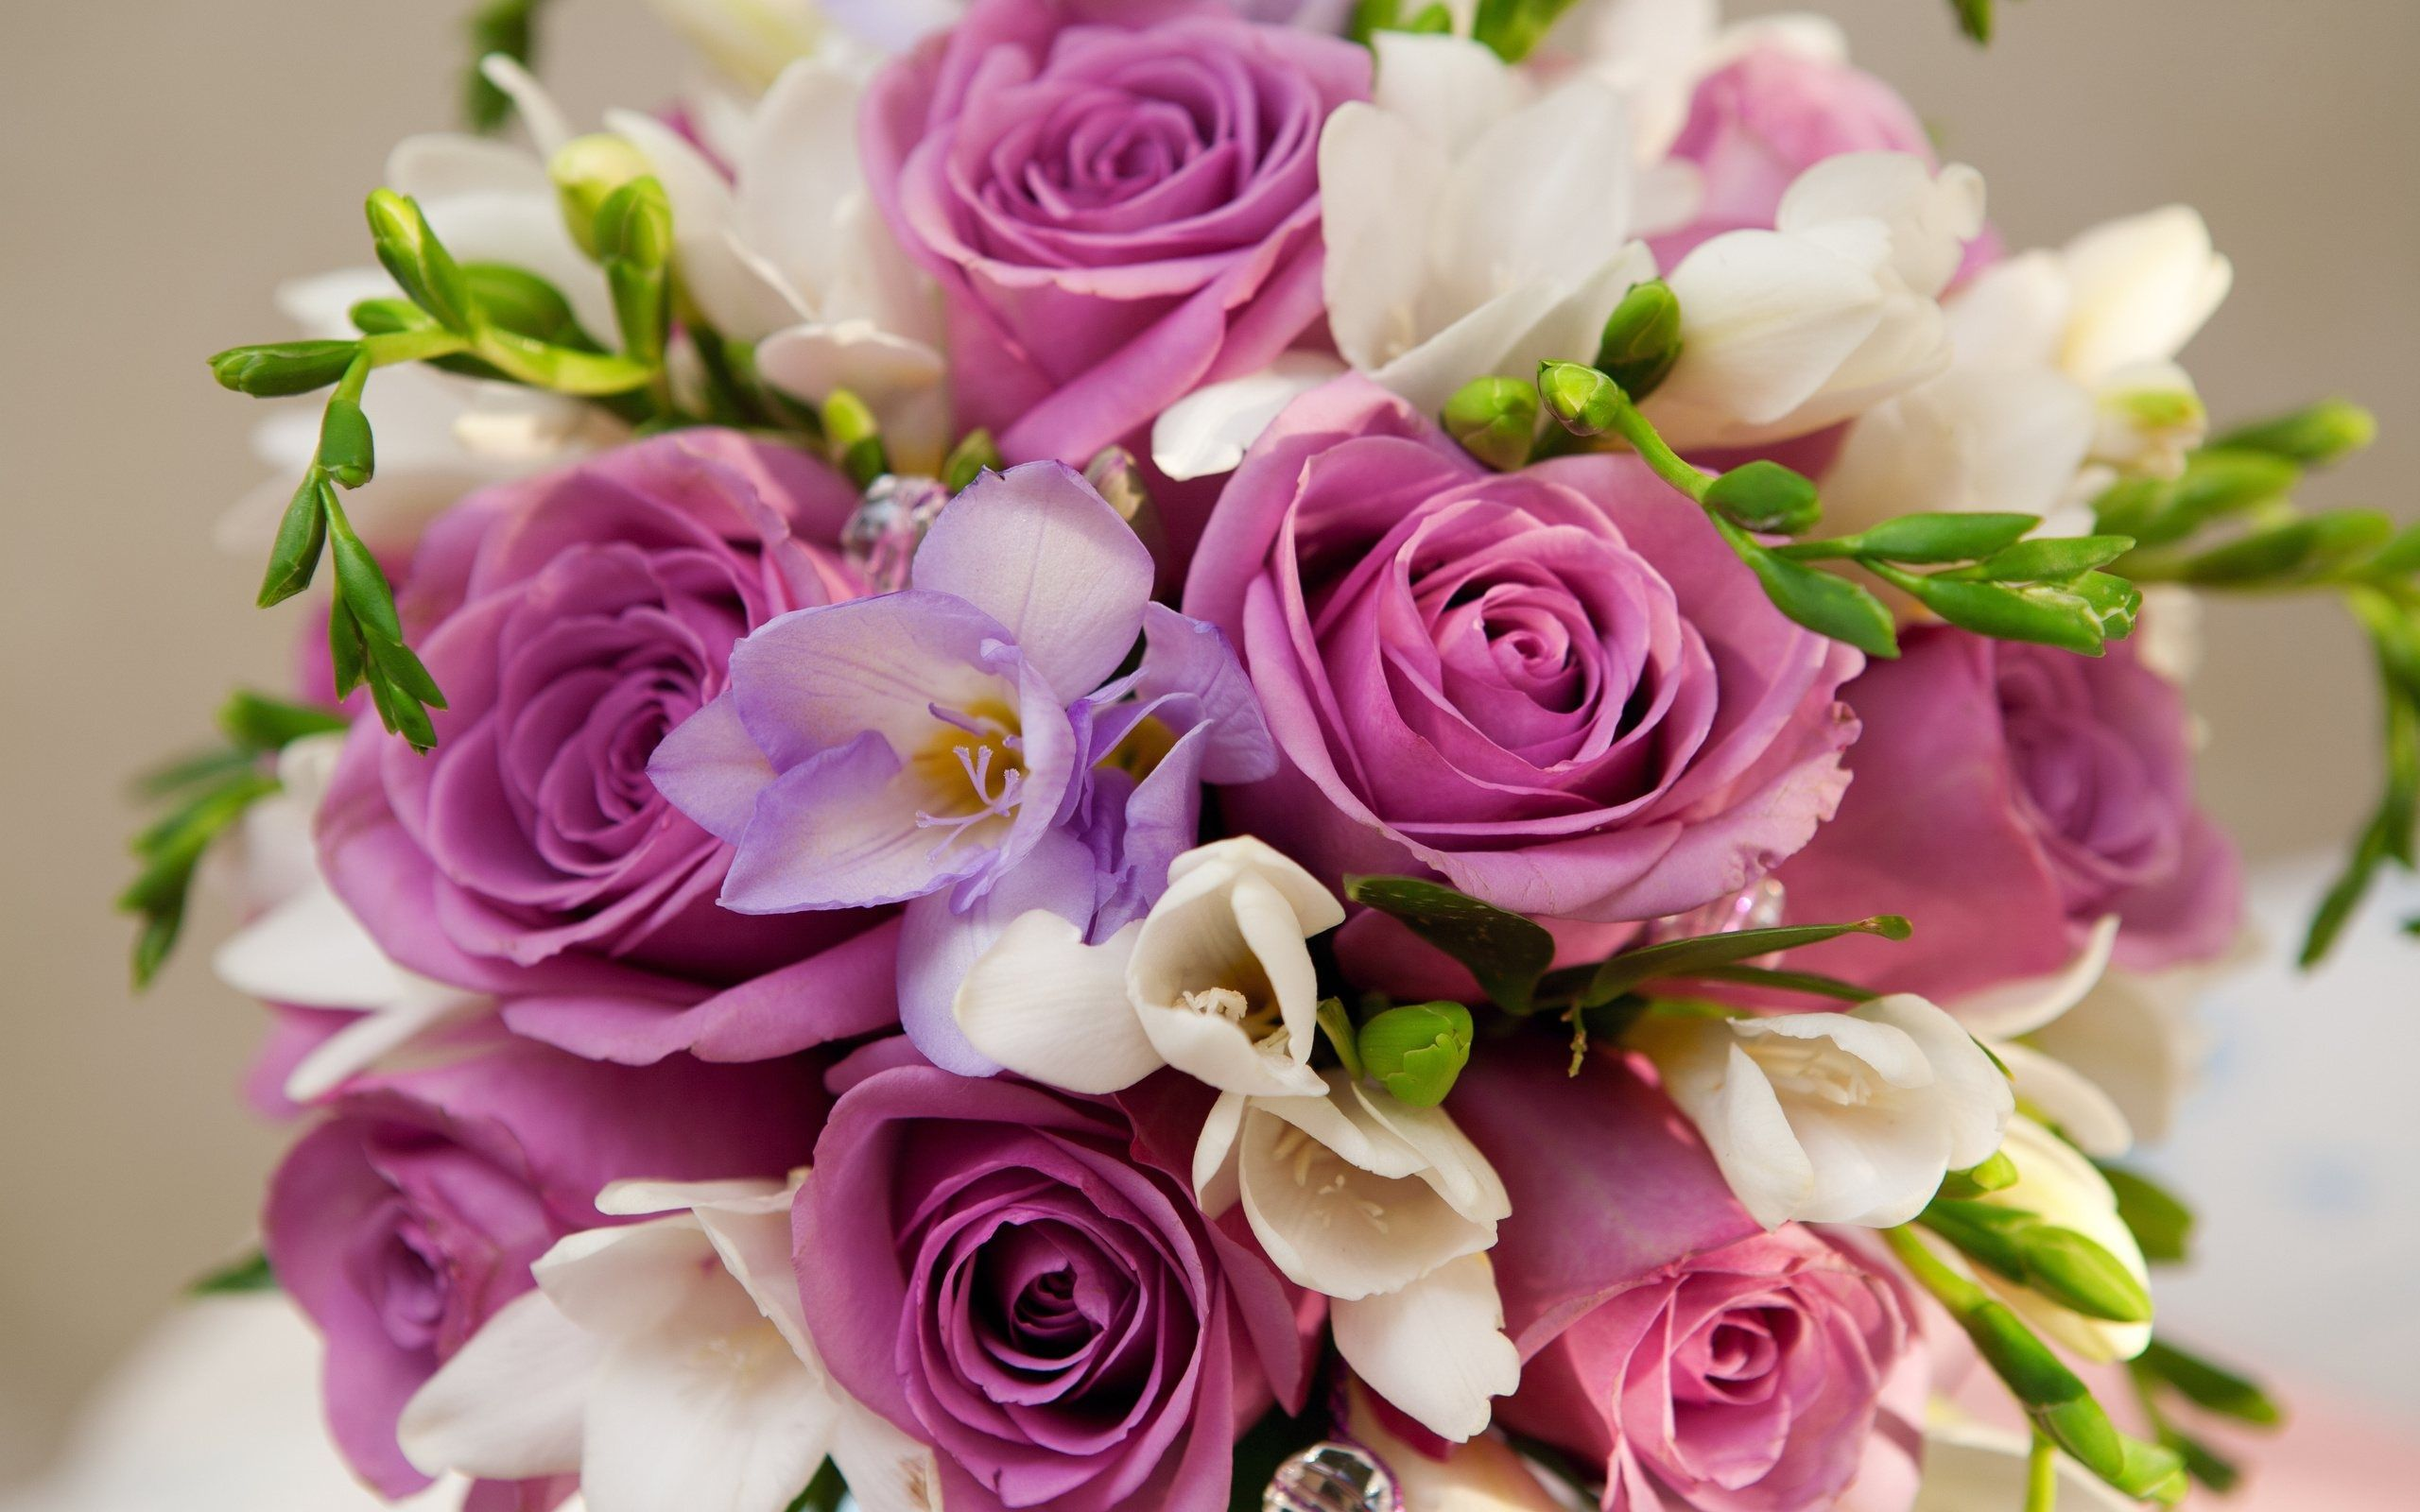 Free Photo Beautiful Flower Bouquet Rose White Pink Free